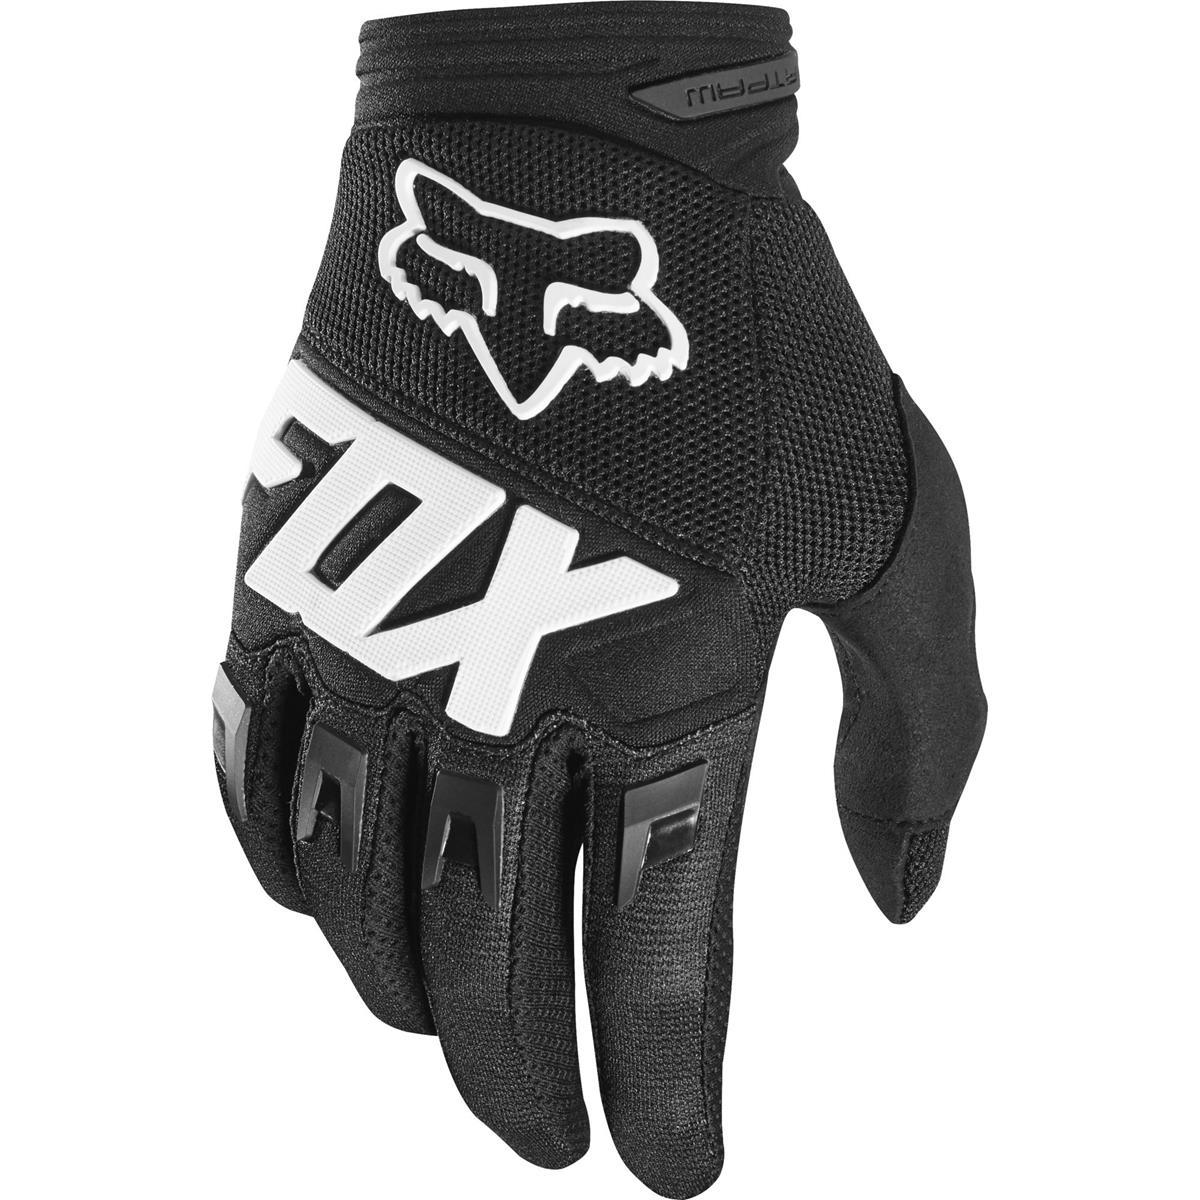 Fox Kids Handschuhe Dirtpaw Race Schwarz